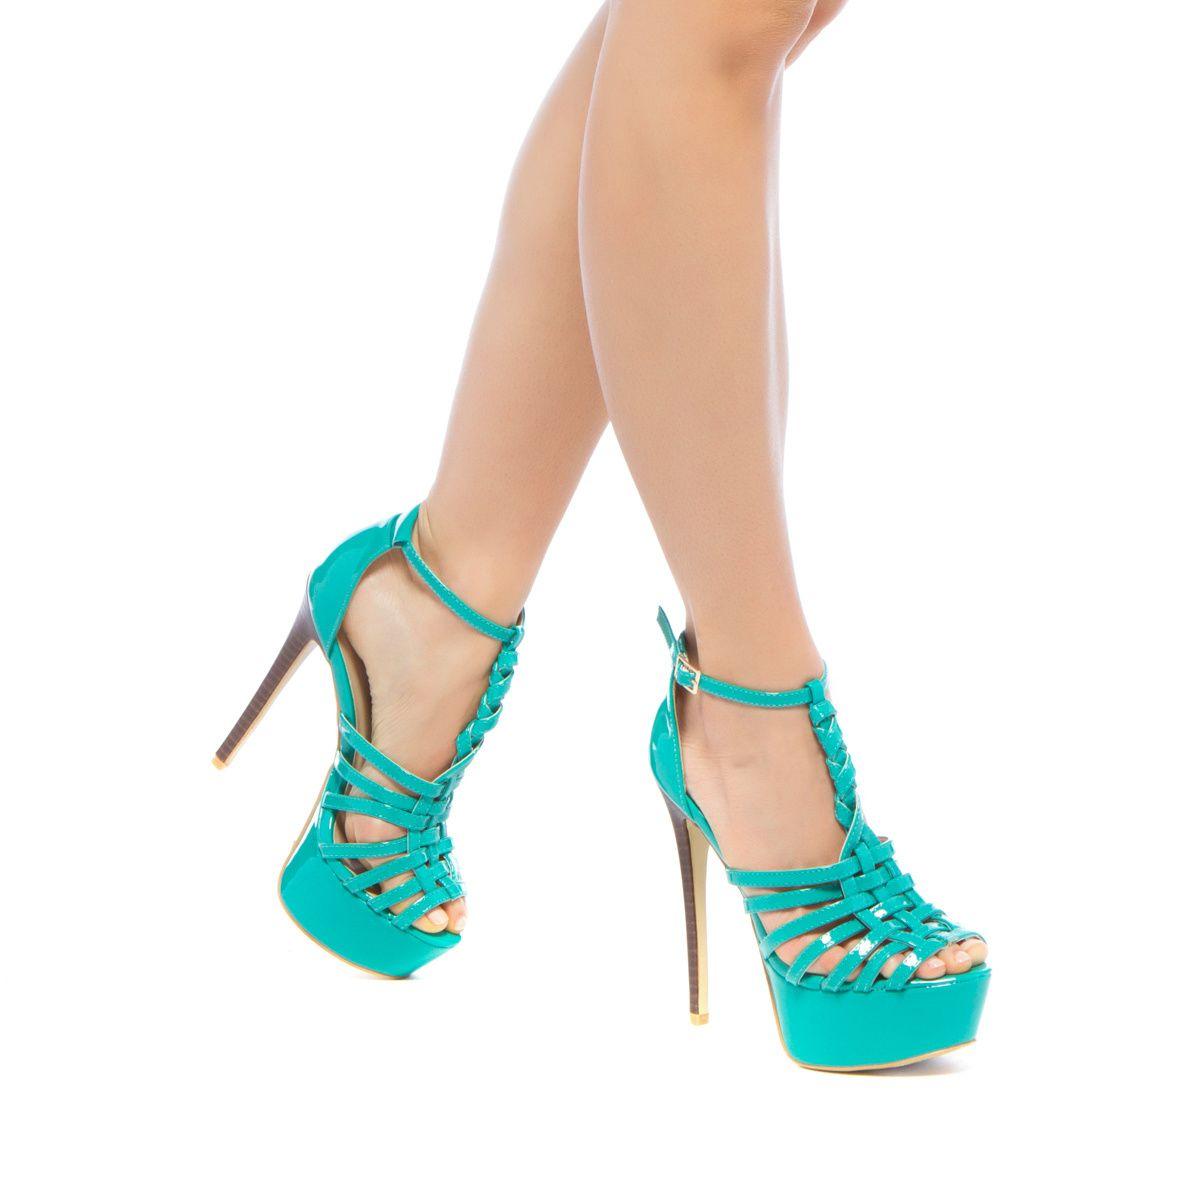 b1ce0ce81f0 Alegra - ShoeDazzle  shoedazzle  stilettosociety  shoedazzle ...